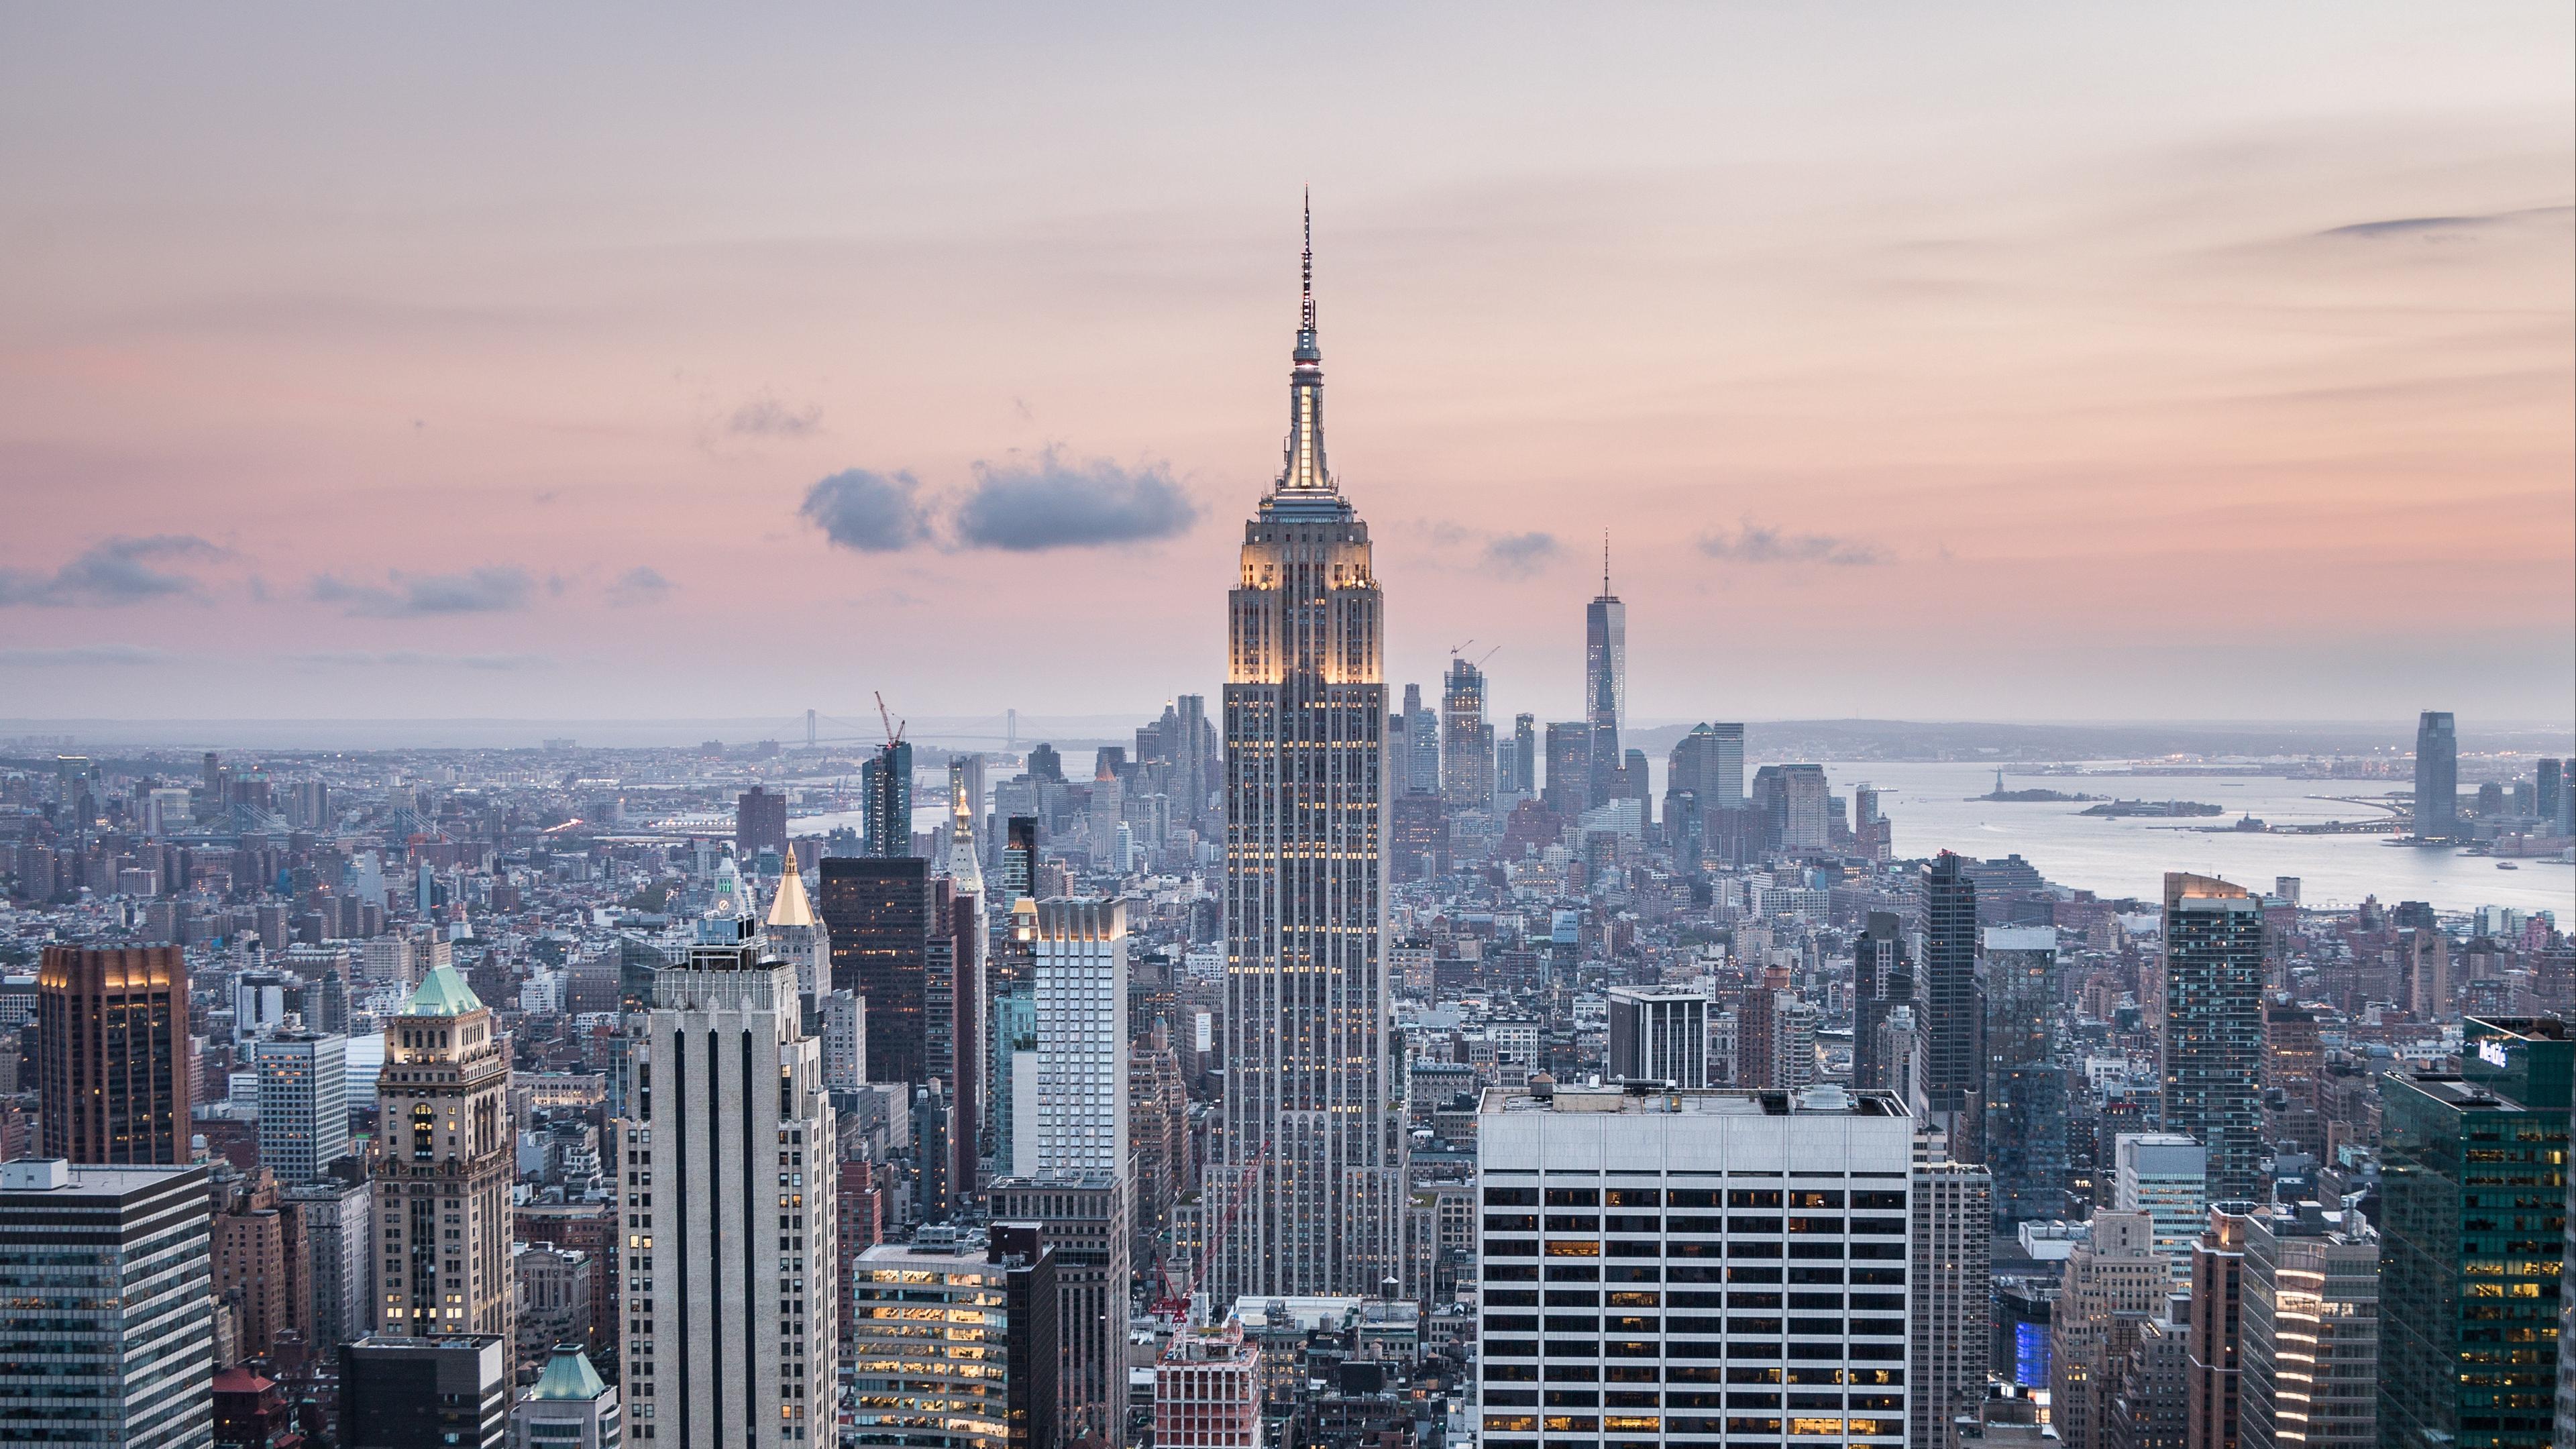 new york usa skyscrapers top view 4k 1538067918 - new york, usa, skyscrapers, top view 4k - USA, Skyscrapers, new york